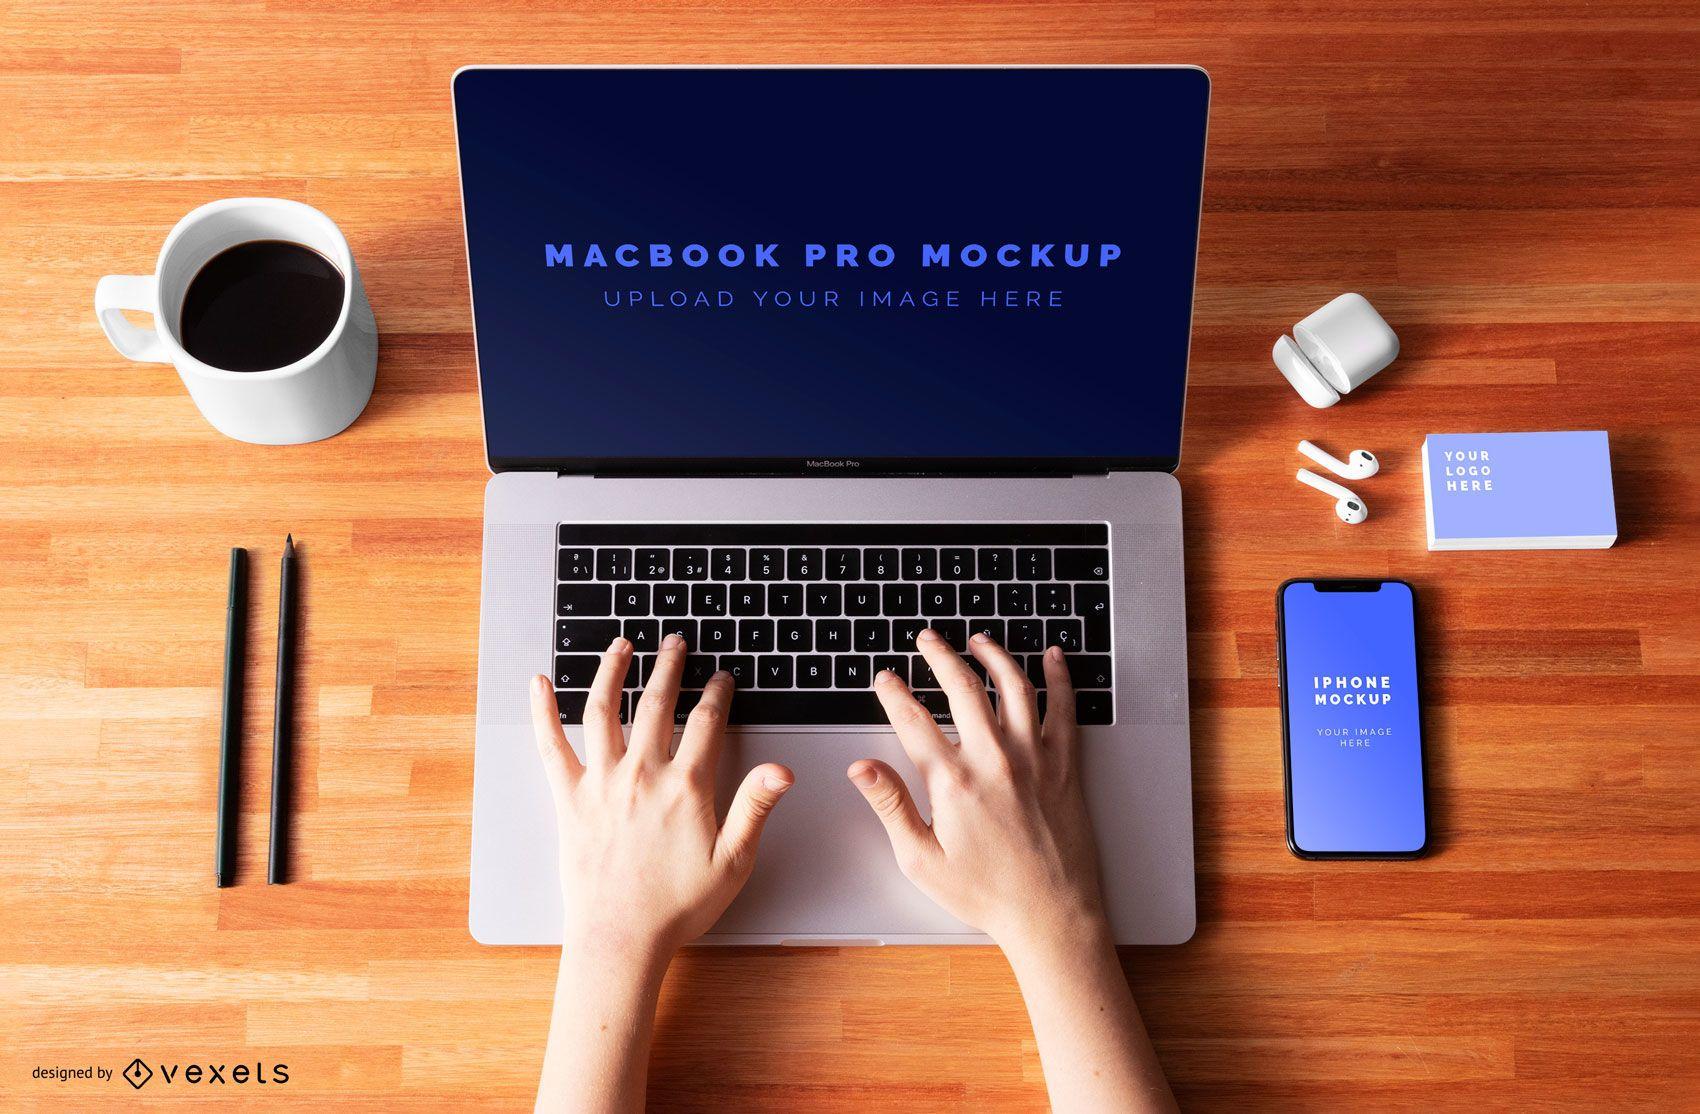 Macbook Pro Mockup Komposition